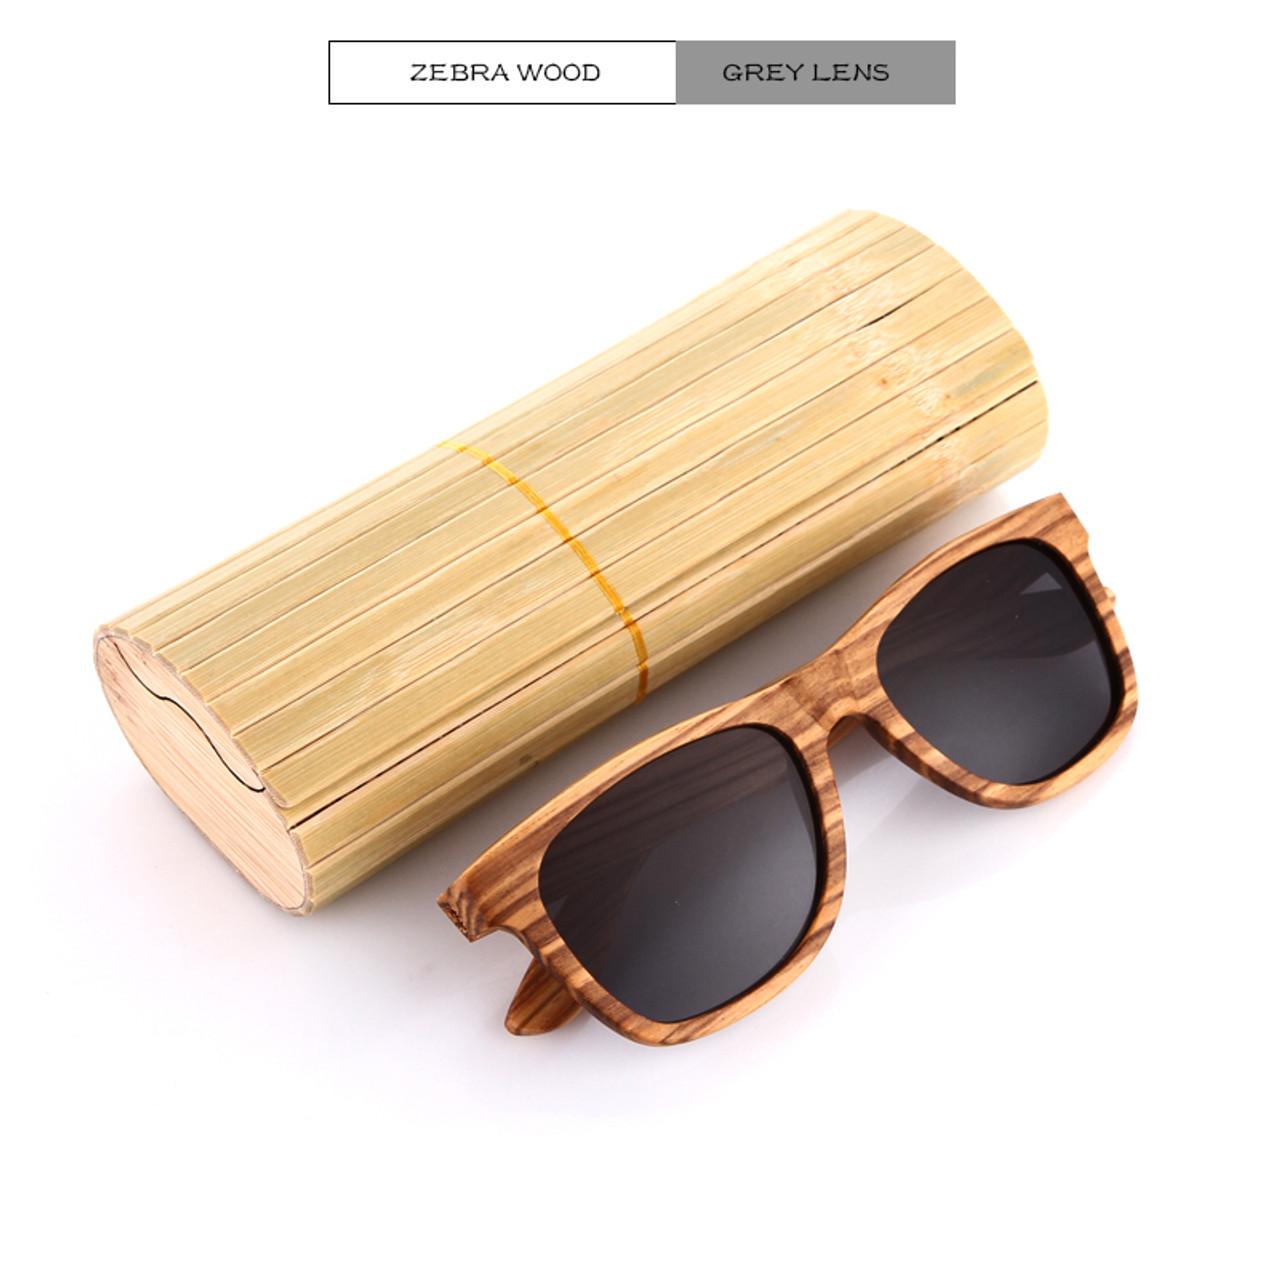 40335424ce6 ... KITHDIA New 100% Real Zebra Wood Sunglasses Polarized Handmade Bamboo  Mens Sunglass Sun glasses Men ...